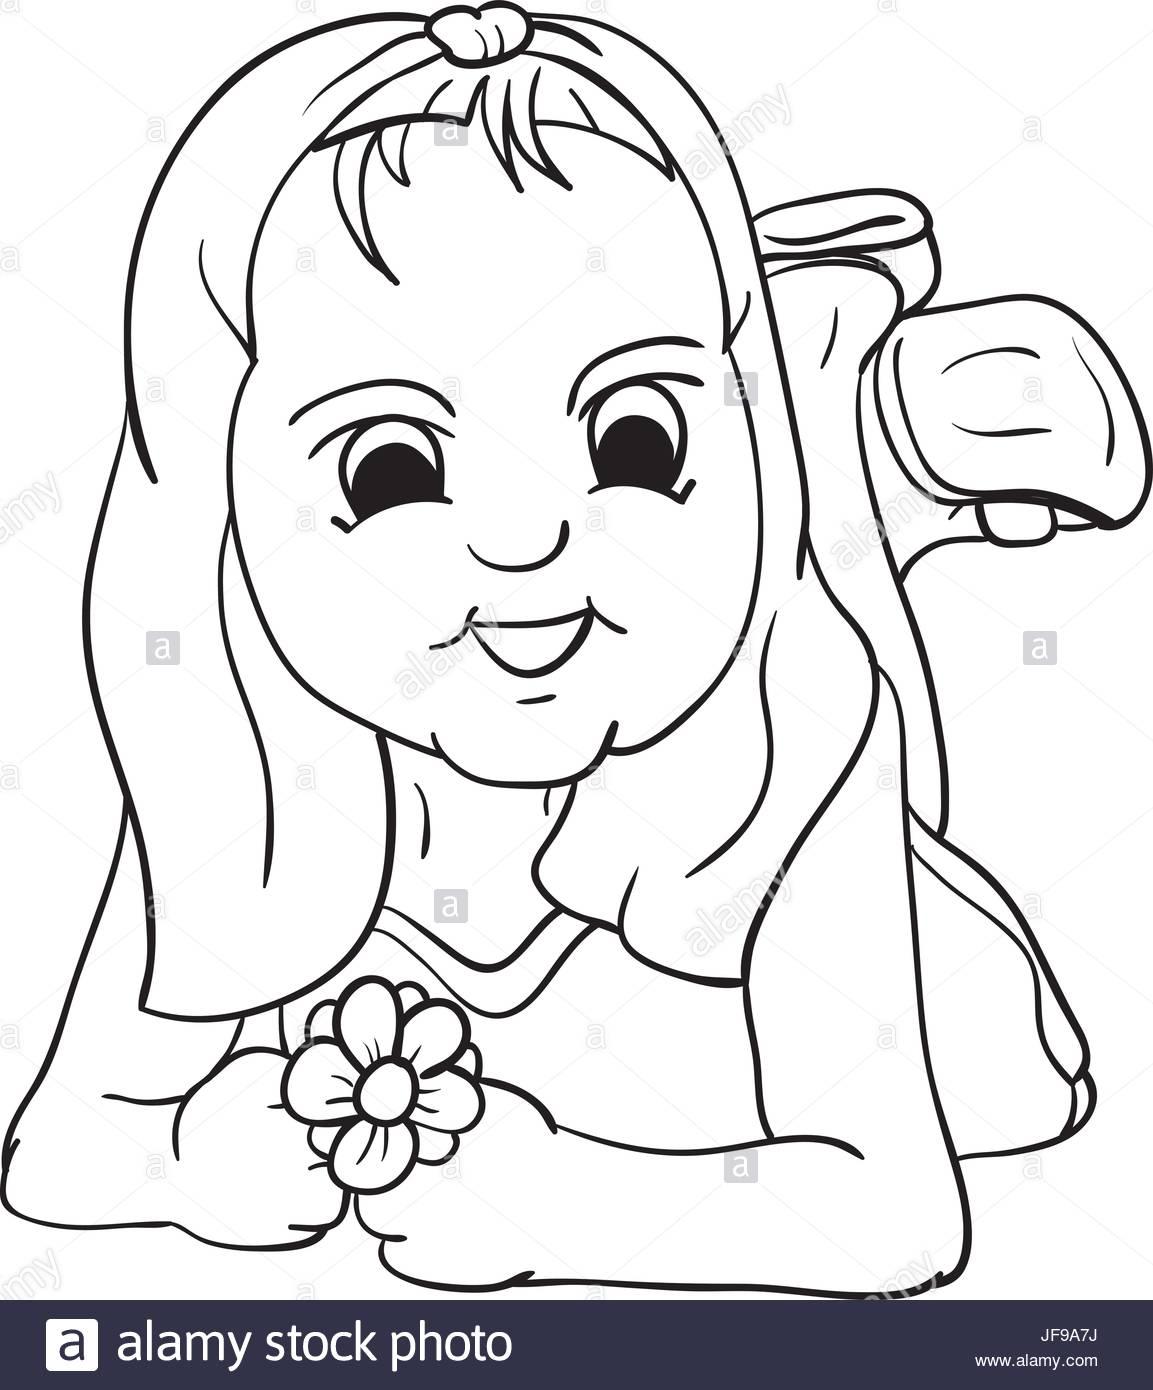 1153x1390 Happy Girl Stock Vector Art Amp Illustration, Vector Image